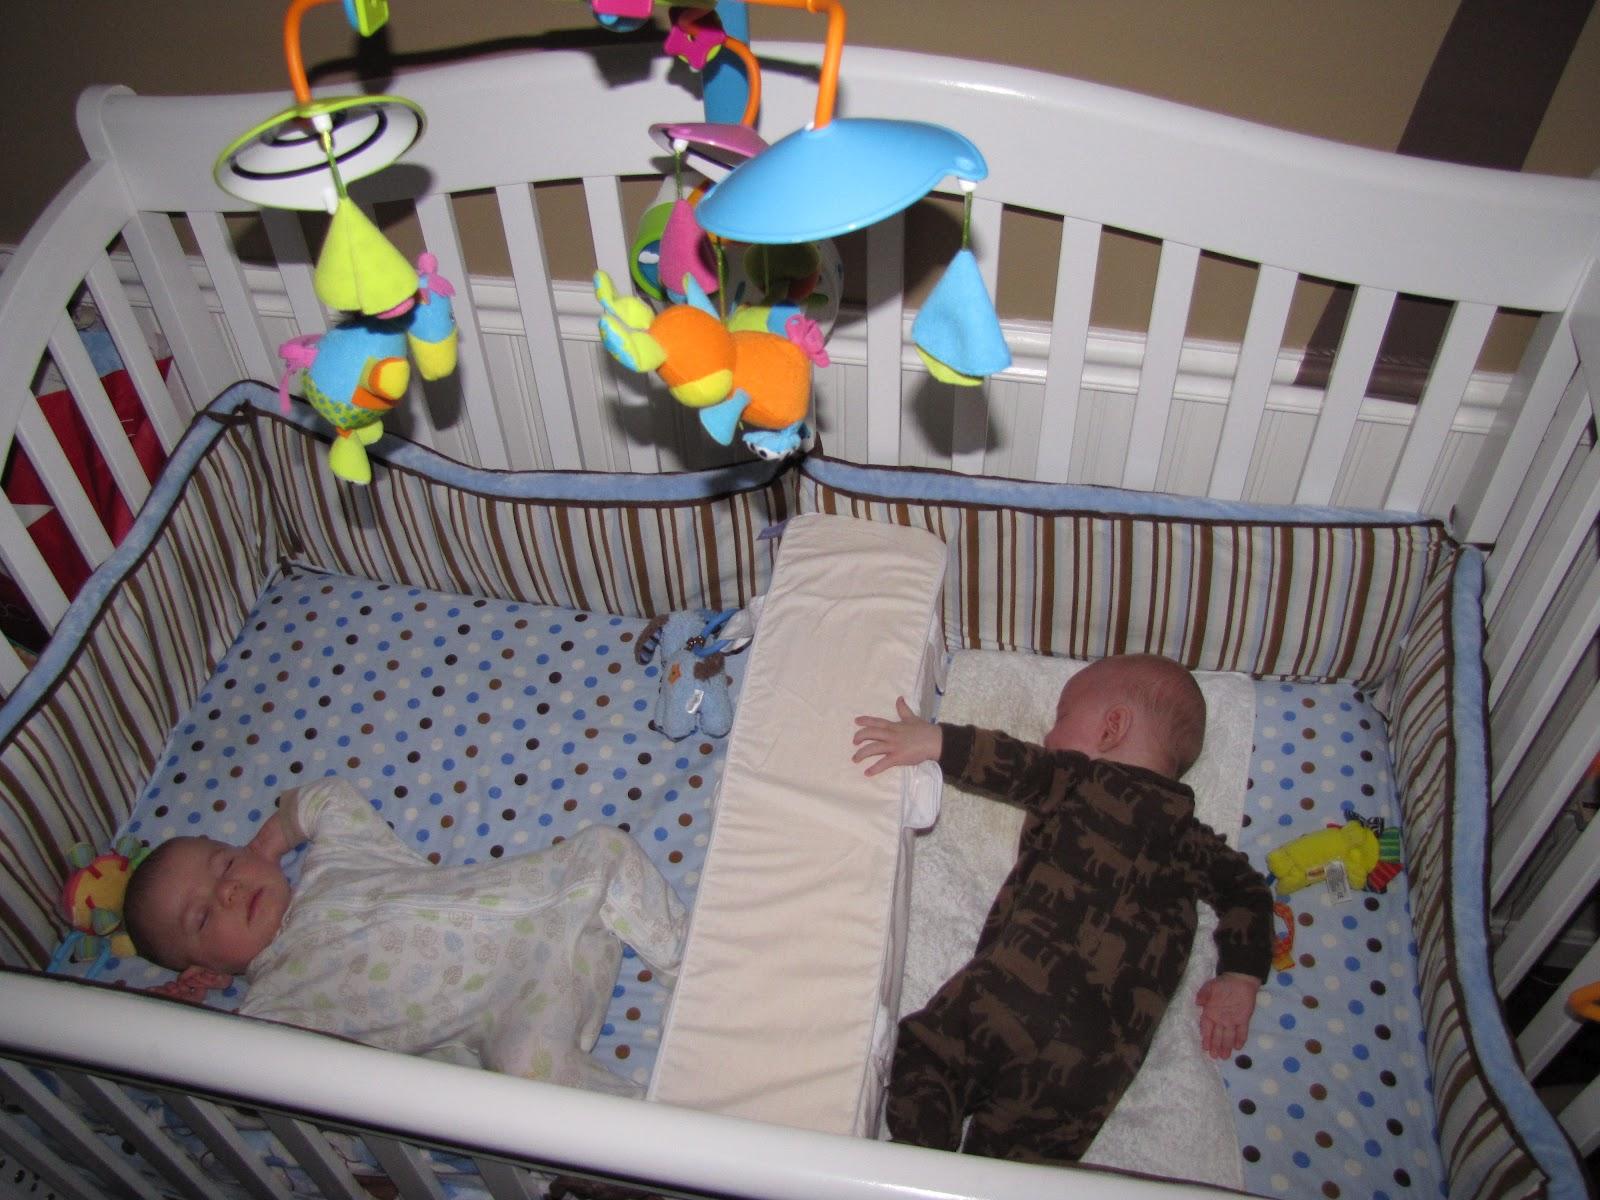 twin baby crib divider photo - 10